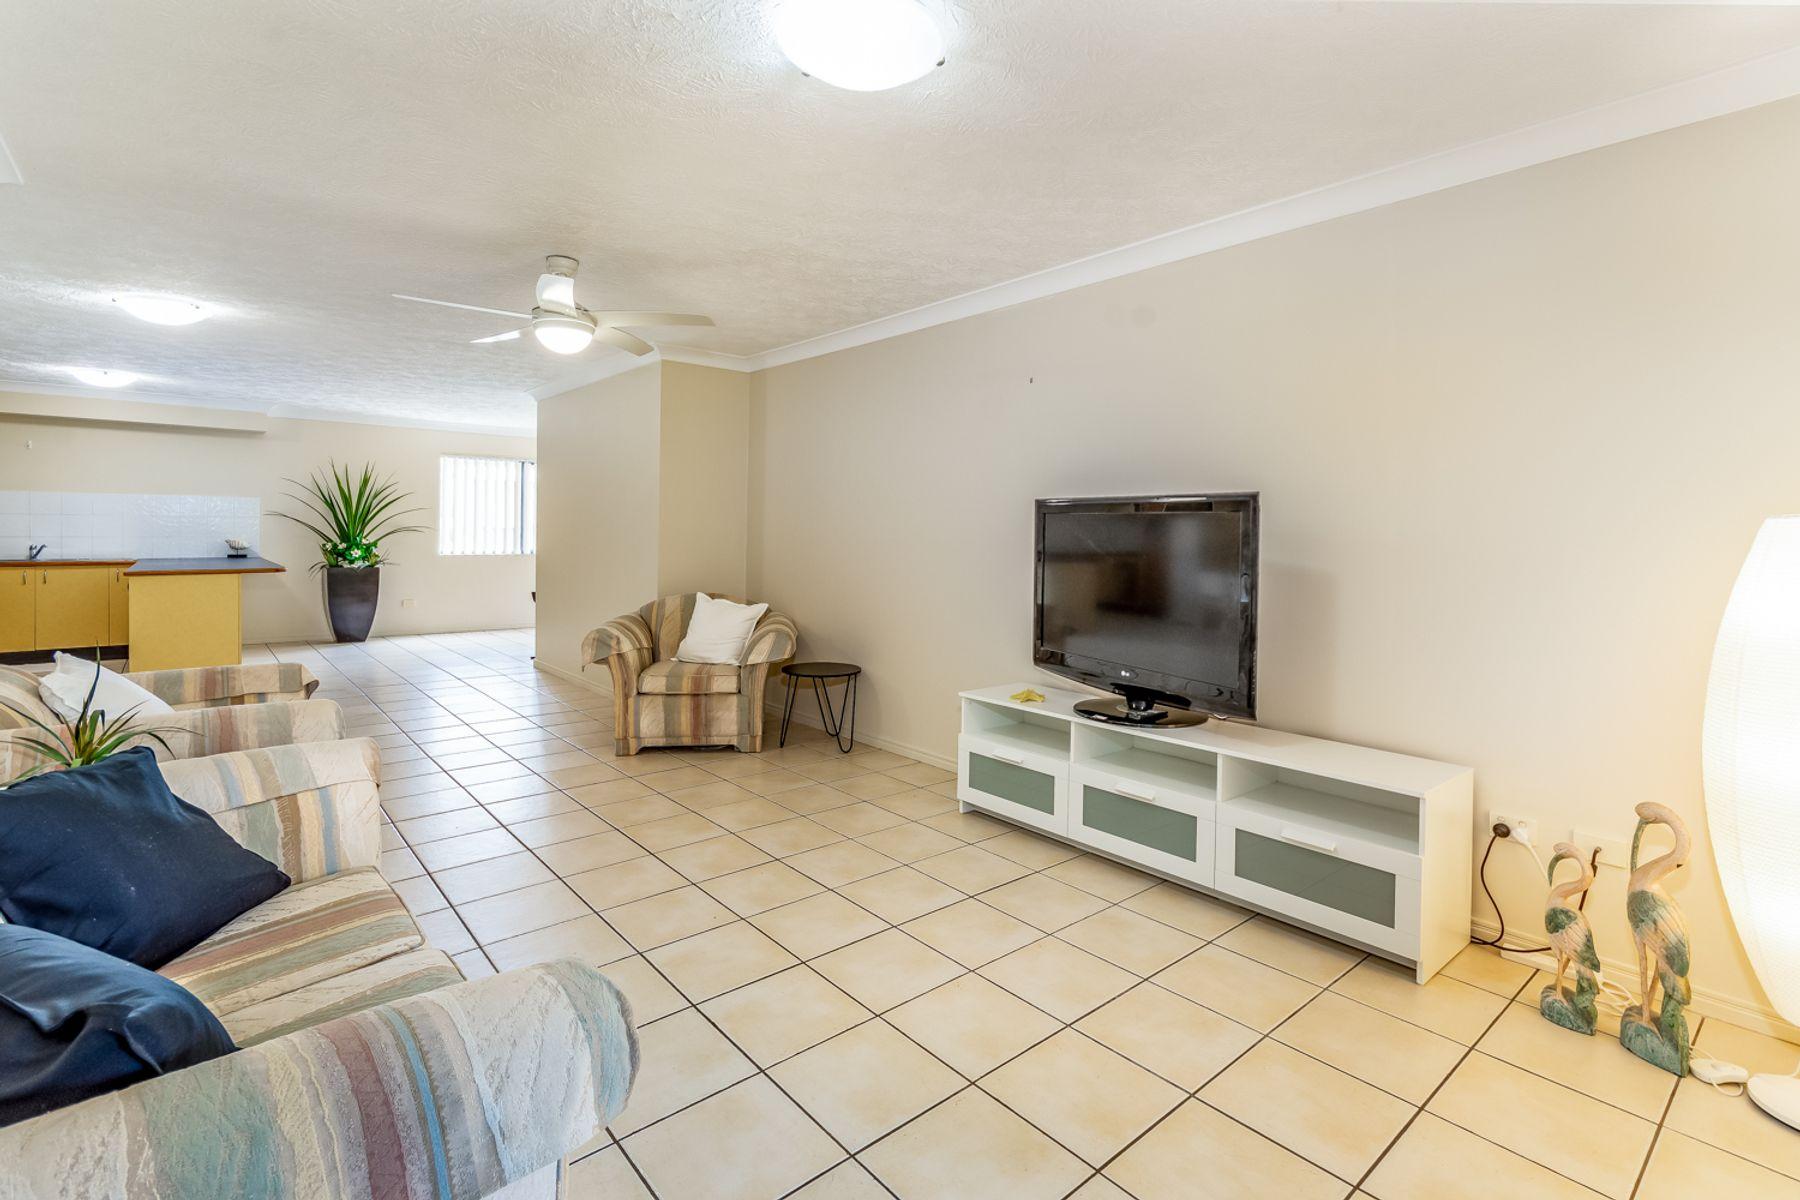 6/54 Winston Drive, Bongaree, QLD 4507